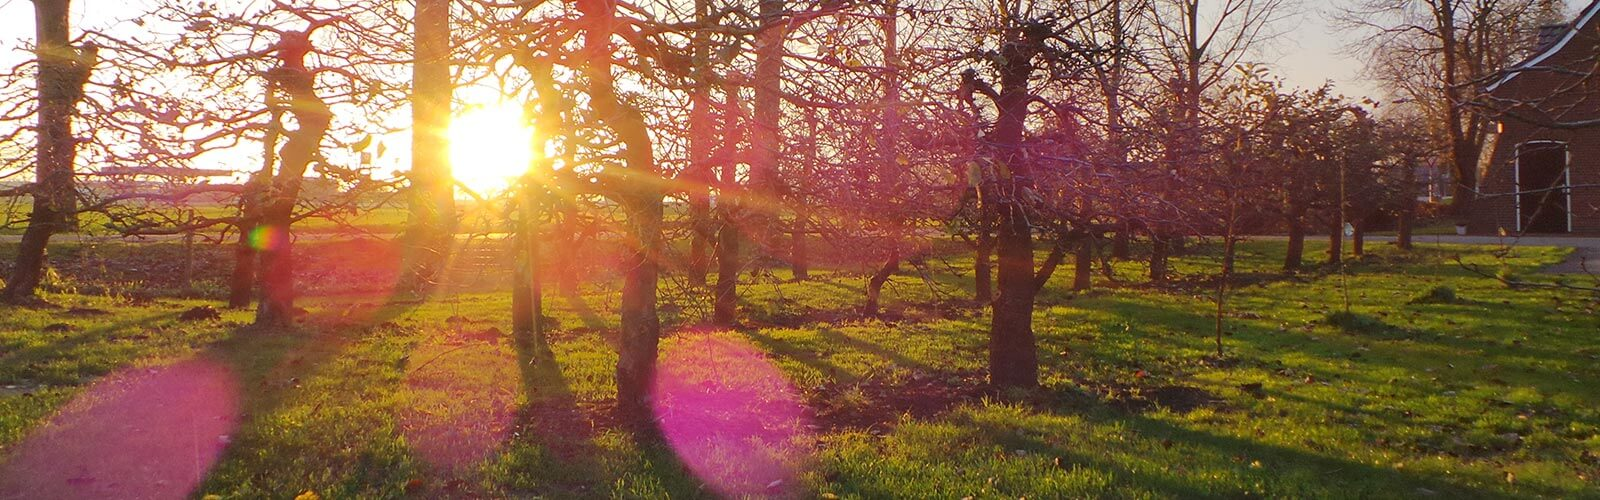 Mooie zonsopgang | De Maasgaarde